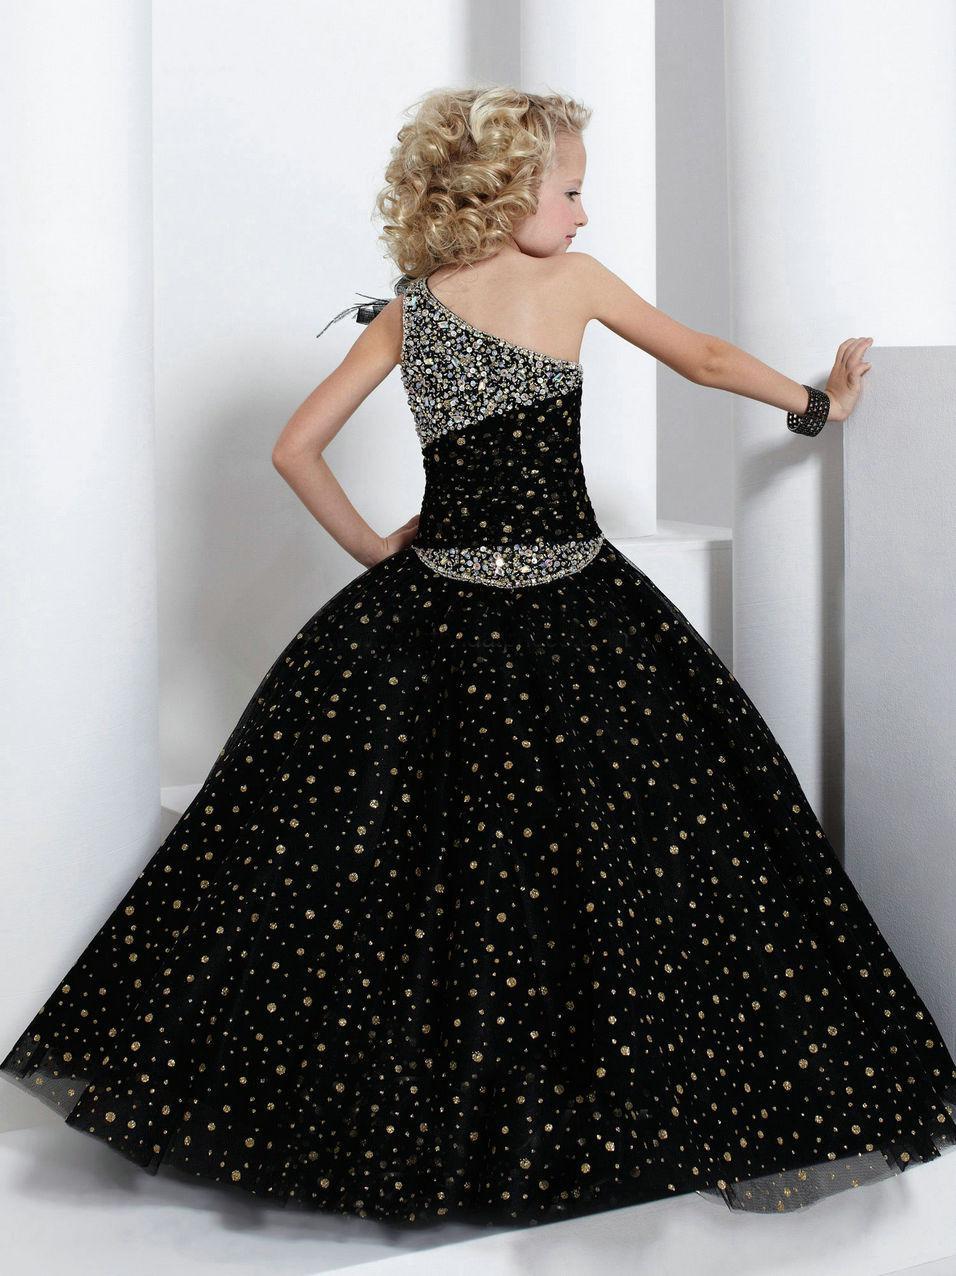 Lindo vestido de baileBlack Beading vestido de concurso de um ombro menina FLG033